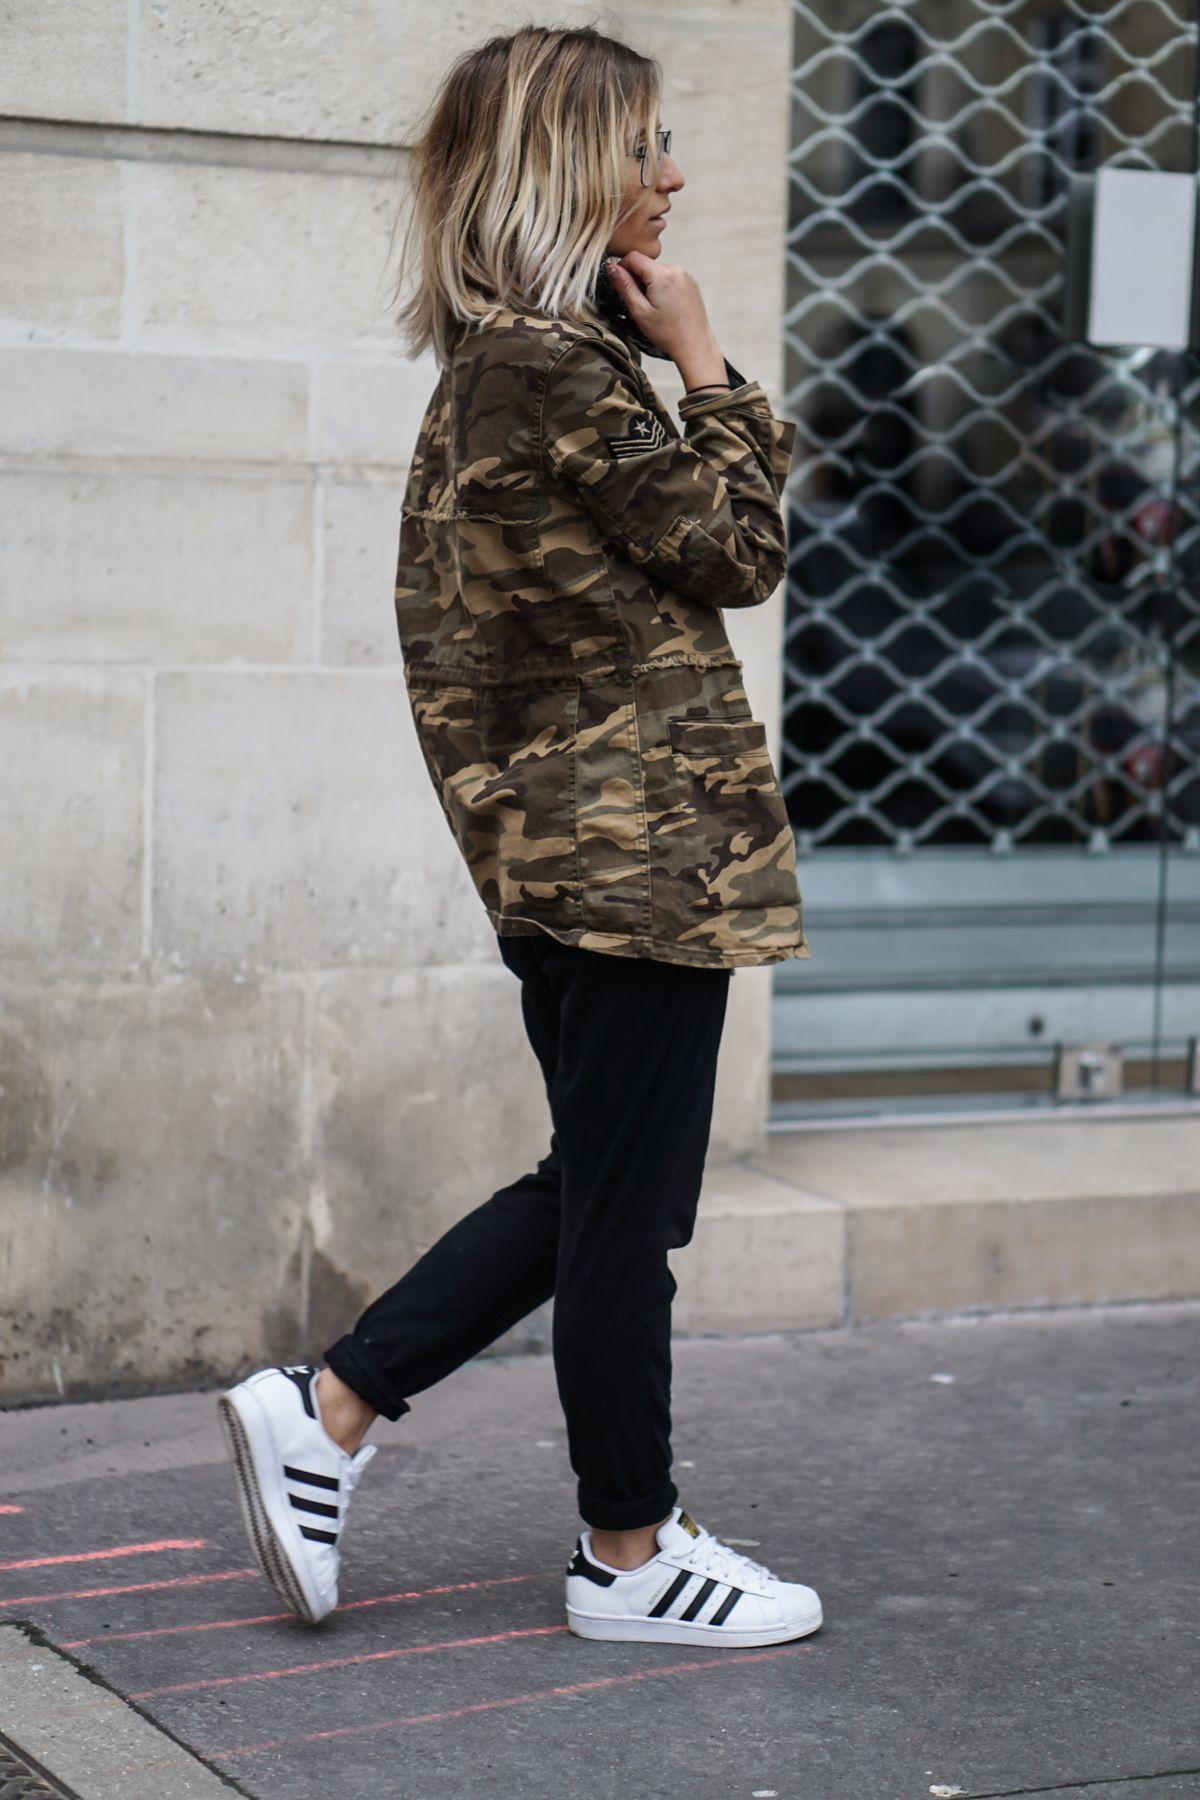 adidas superstar femme militaire